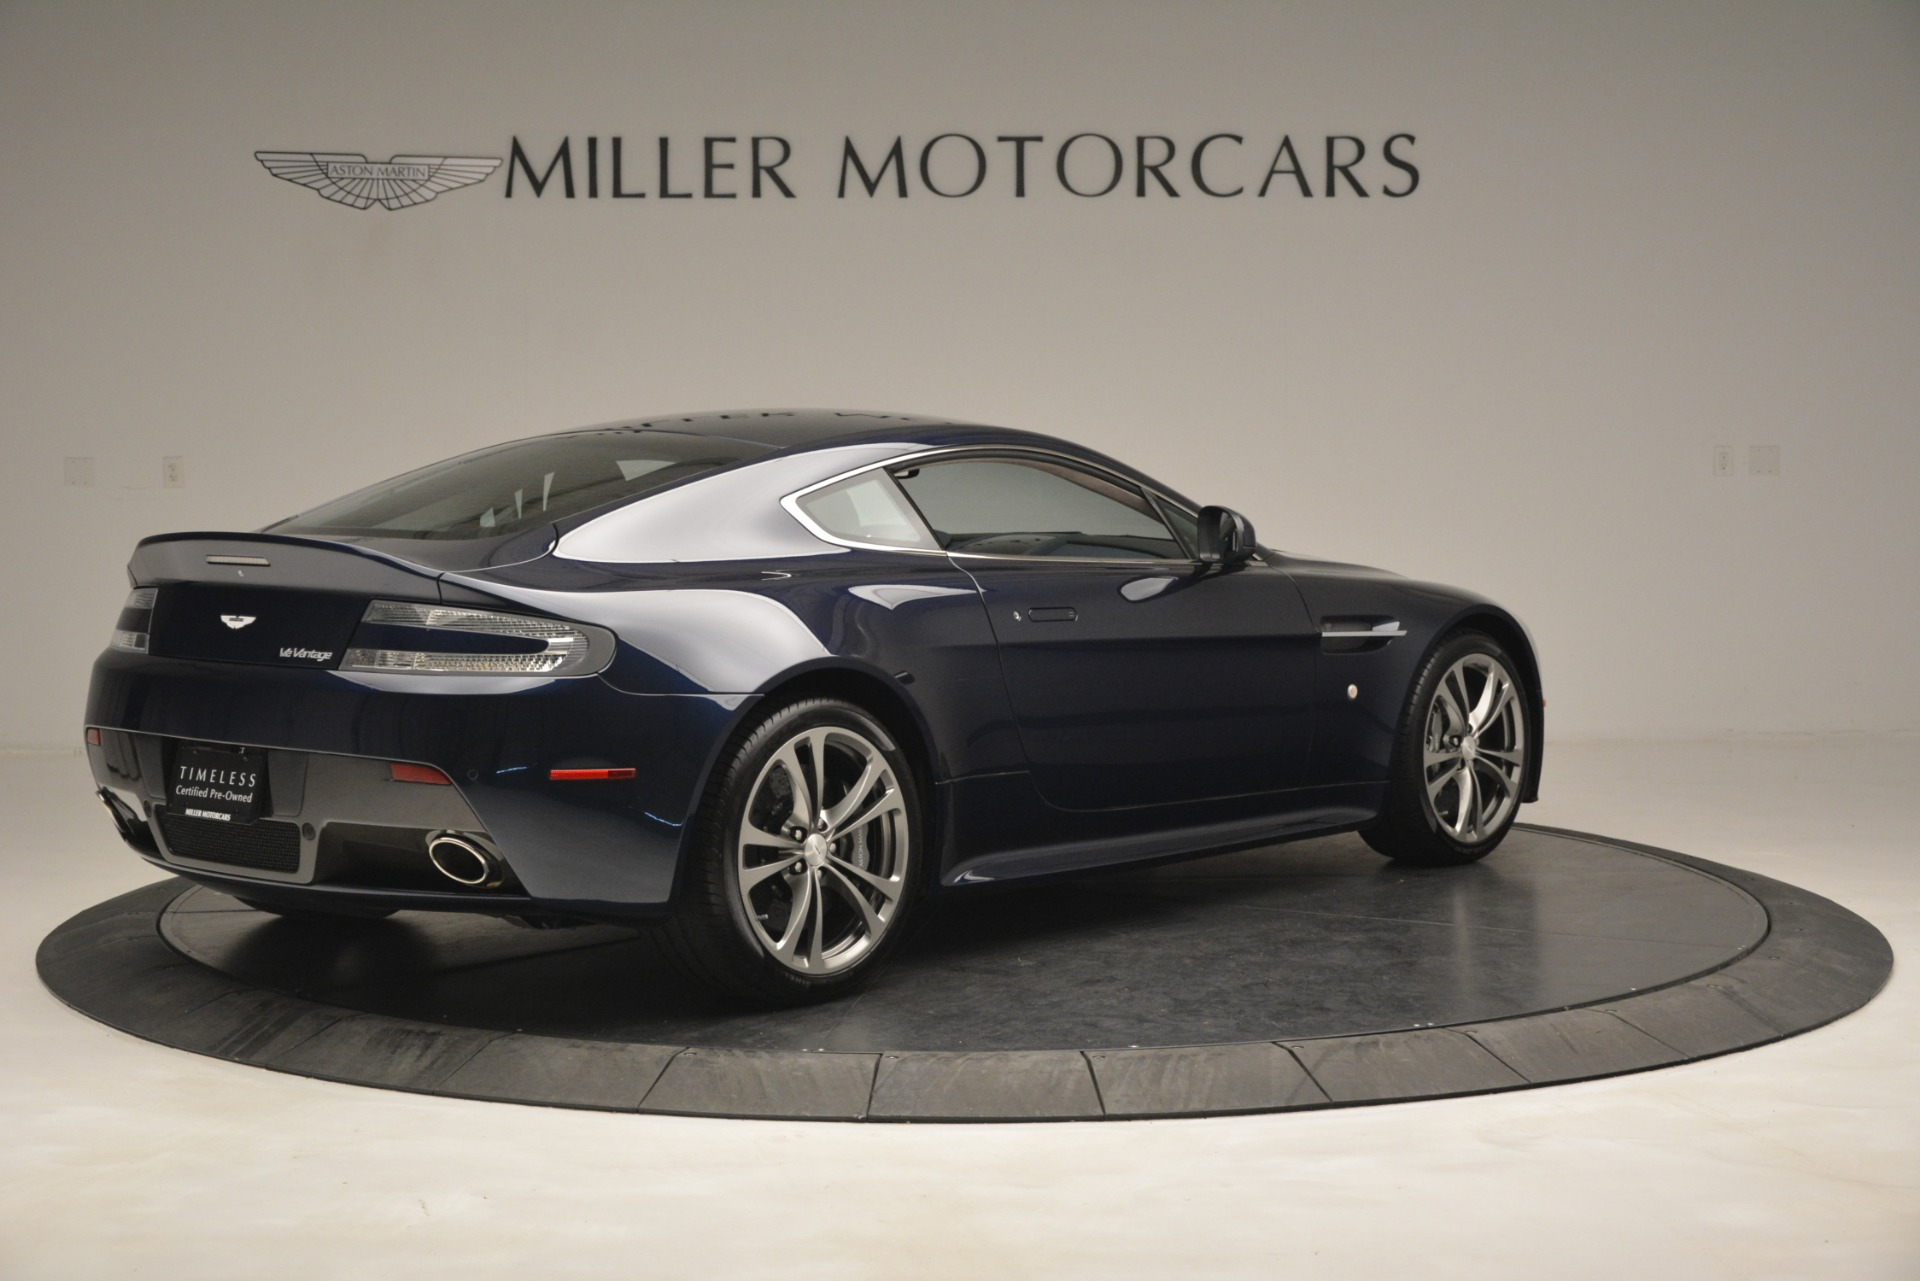 Used 2012 Aston Martin V12 Vantage  For Sale In Greenwich, CT. Alfa Romeo of Greenwich, 7524 3046_p8